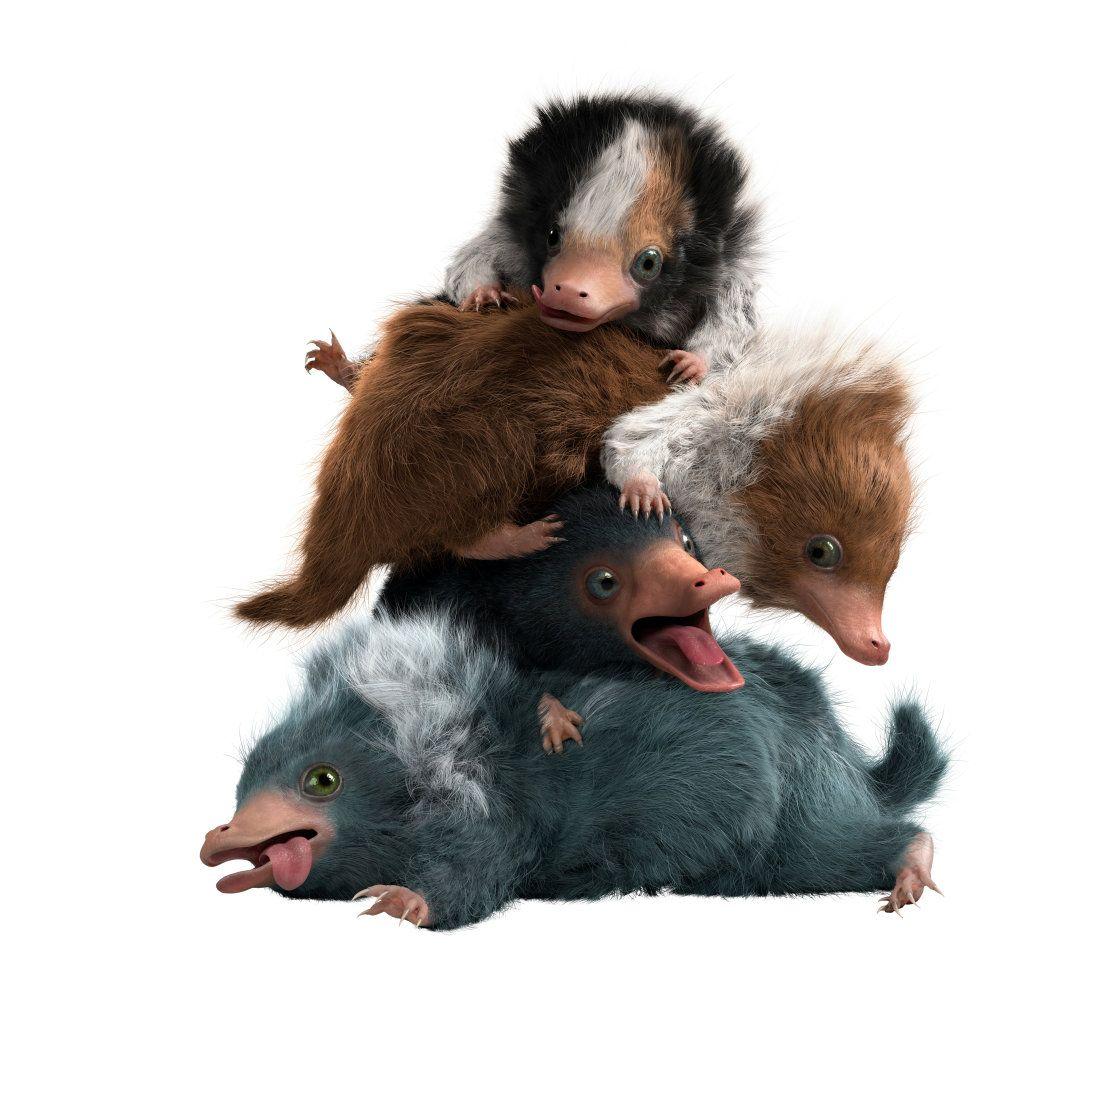 Baby Nifflers From Fantastic Beasts The Crimes Of Grindelwald Fantastische Tierwesen Phantastische Tierwesen Tierwesen